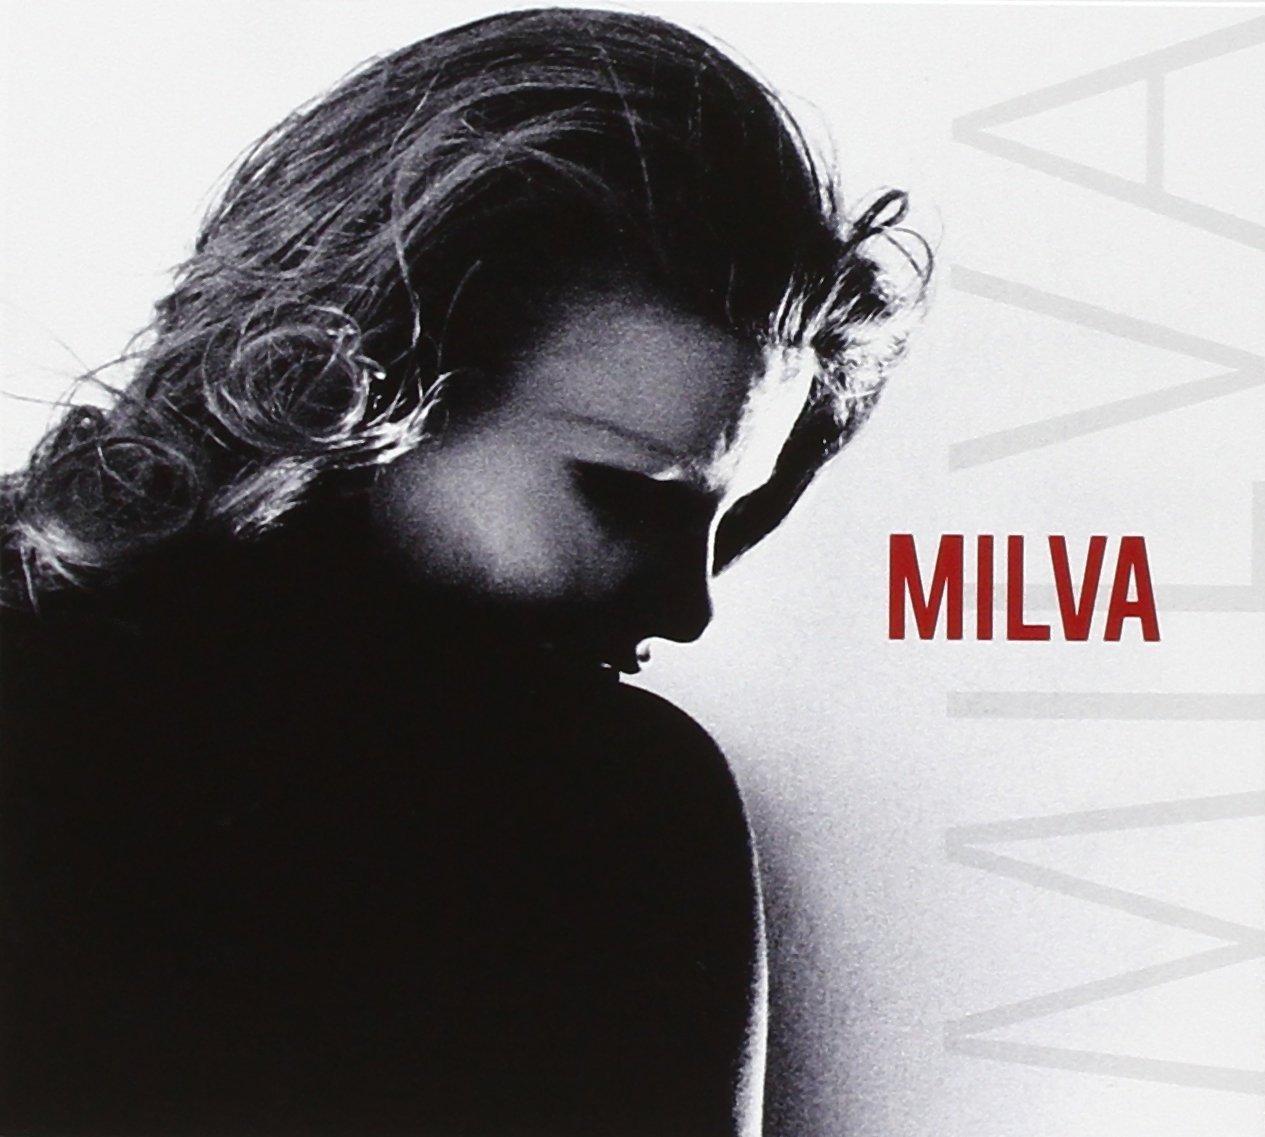 Milva - Milva Best Hits - Artist Best Selection